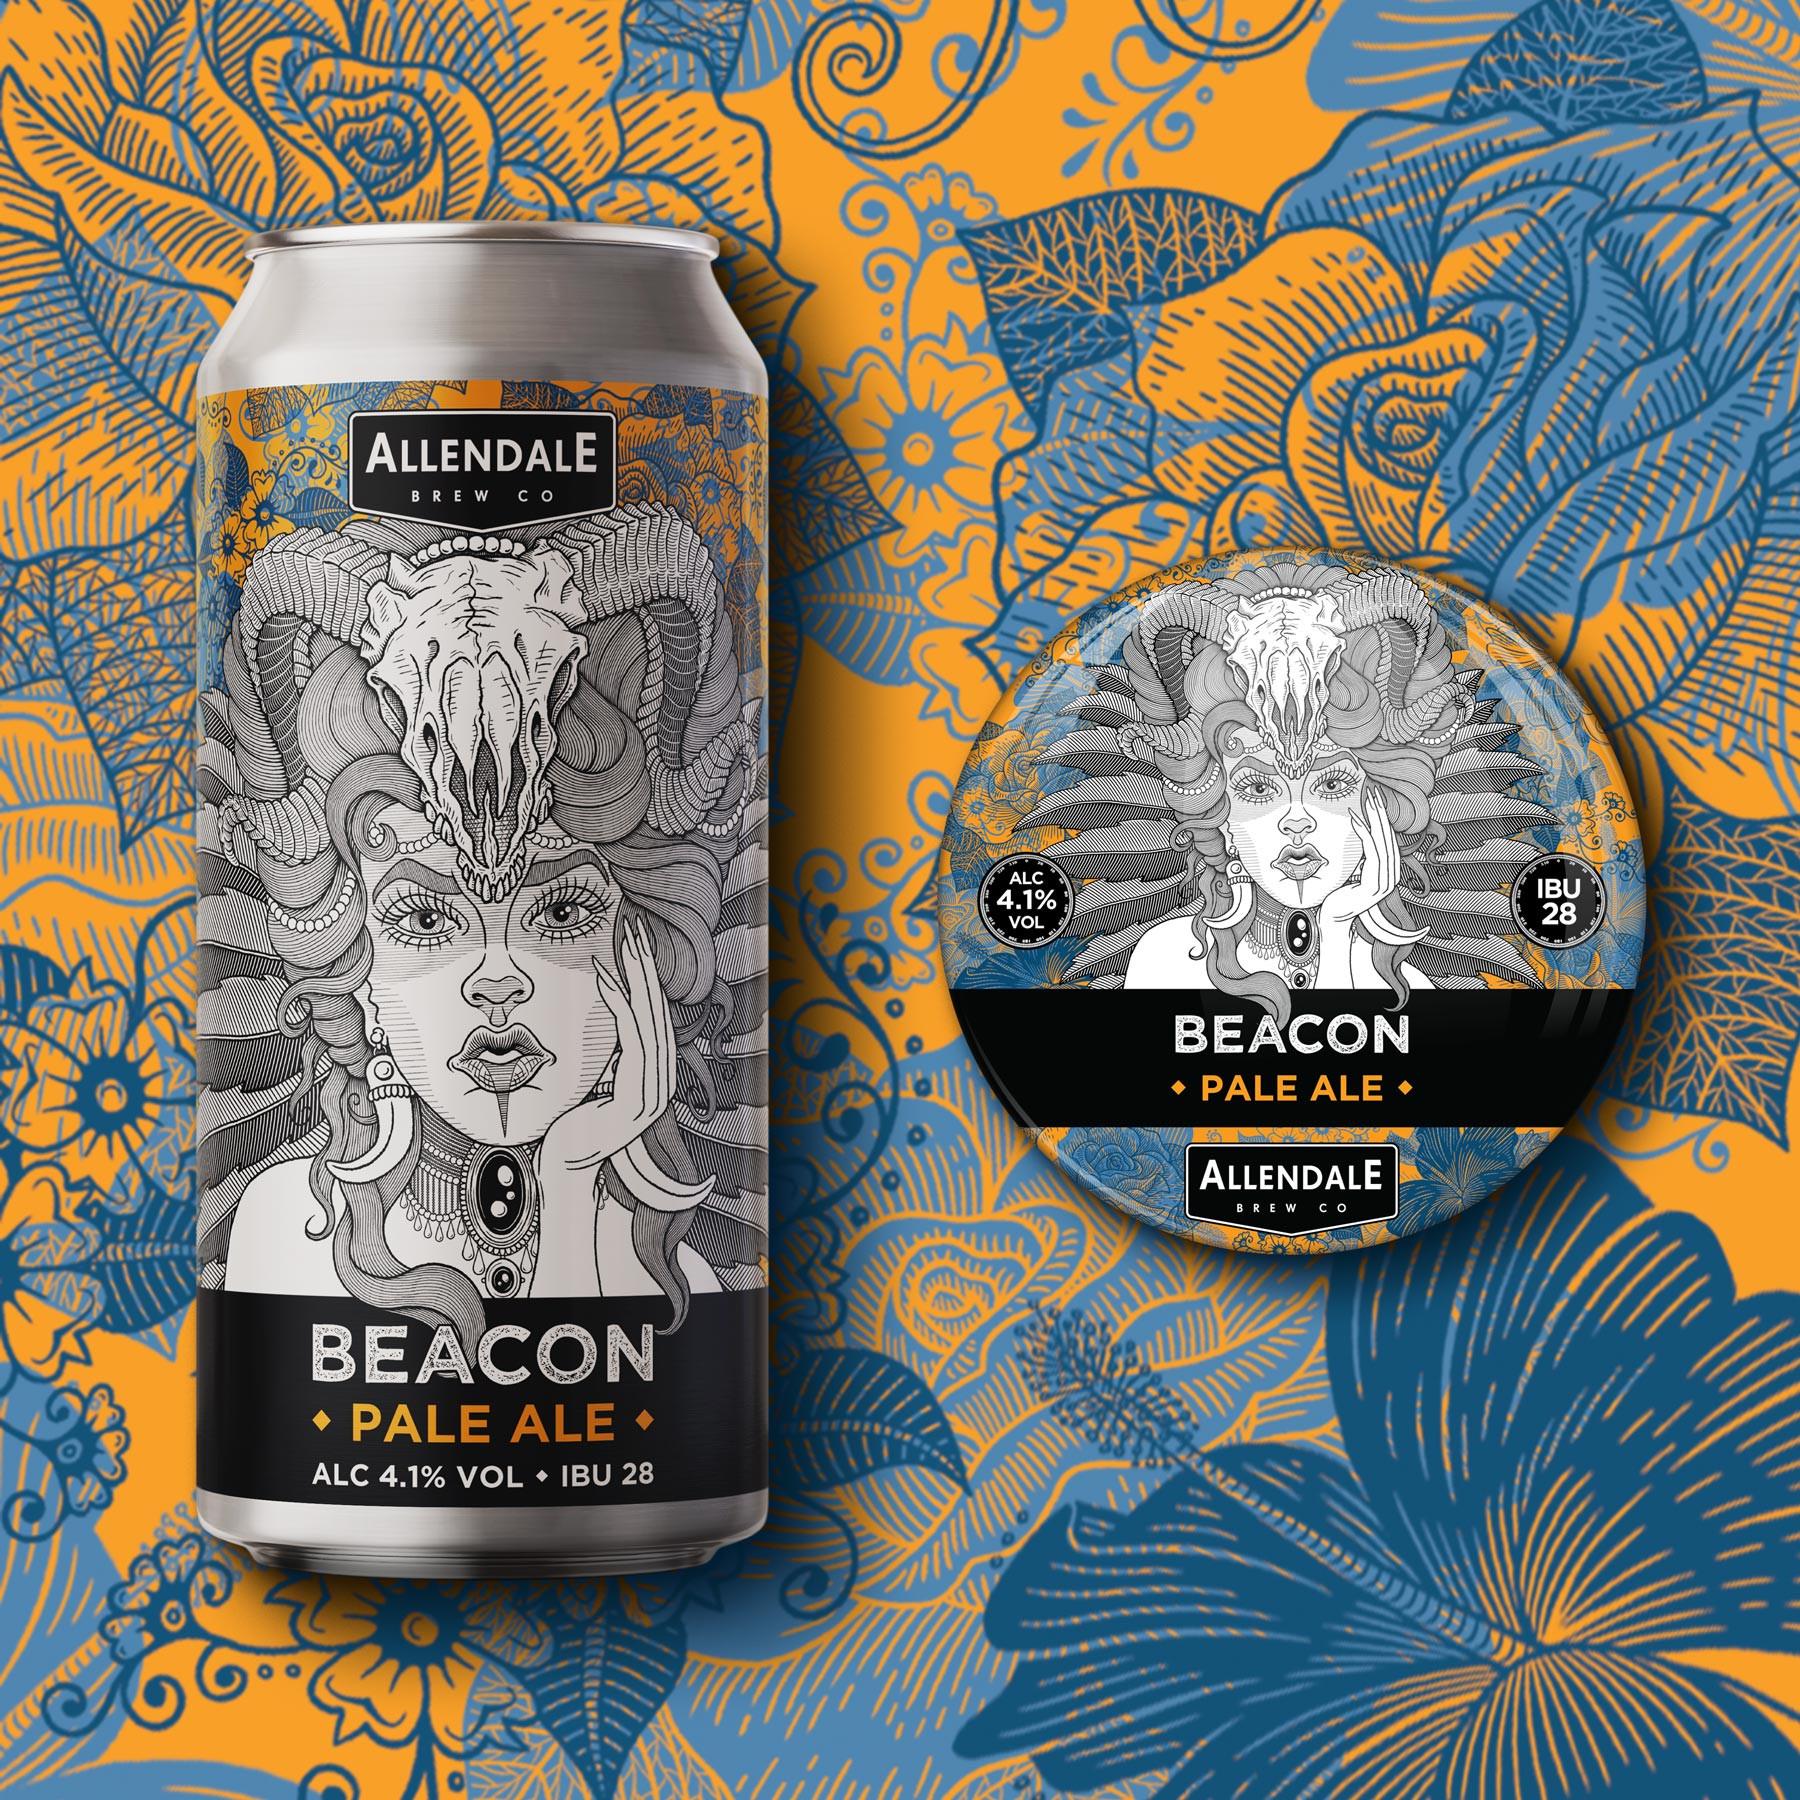 allendale-beacon-beer-label-design-marti